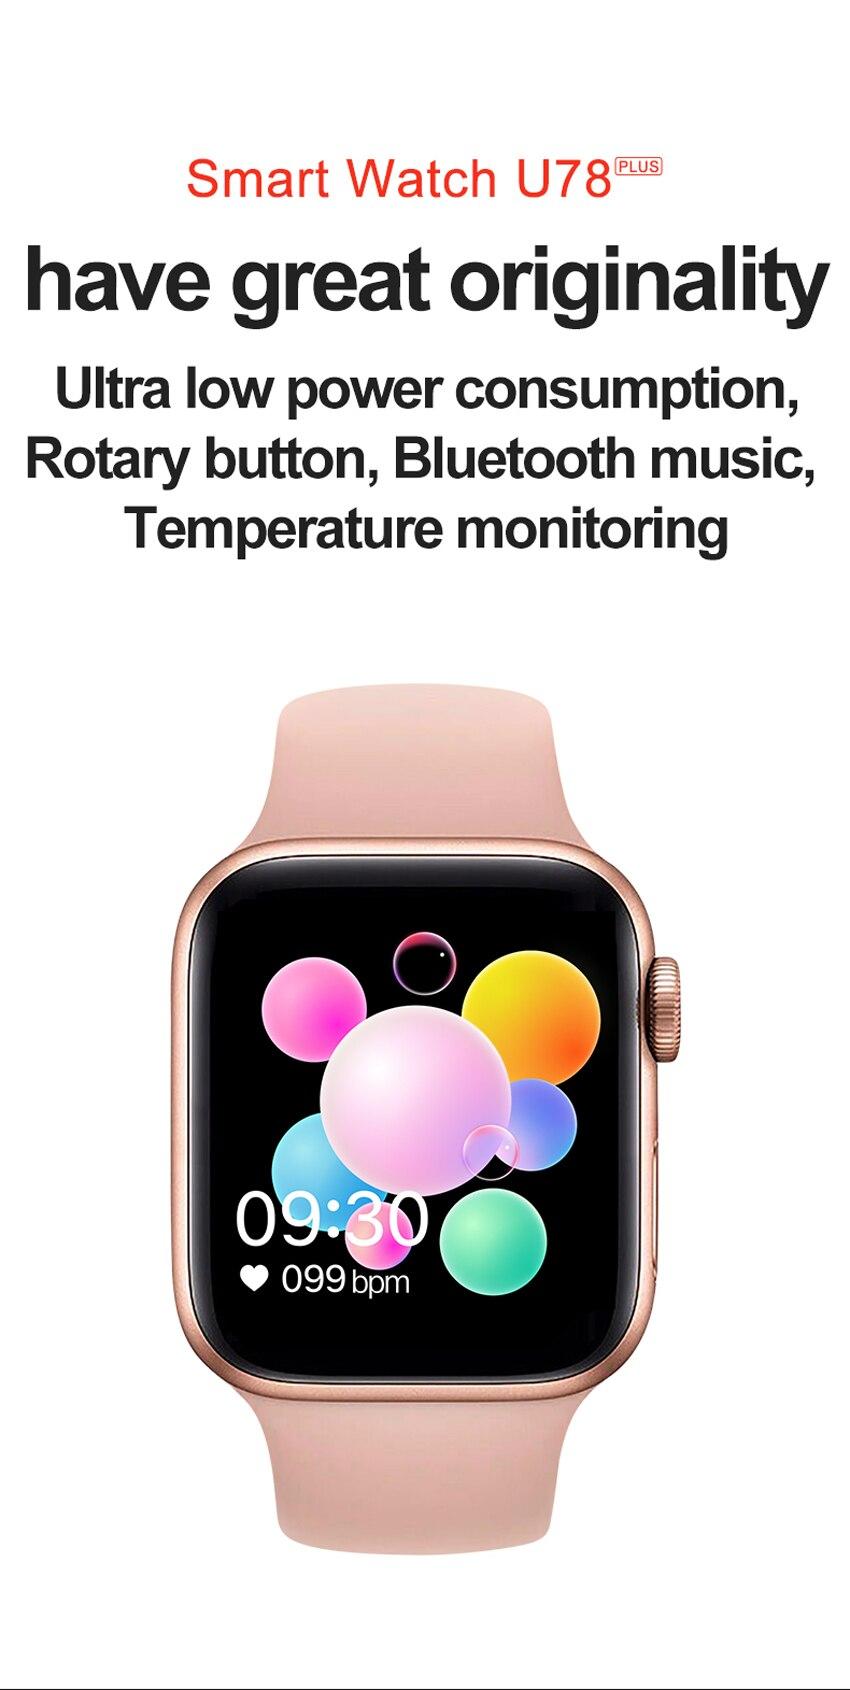 Uacd94ec7caa847b381ace4a33d3d521eb U78 Plus Smart Watch Bluetooth Phone Call Smartwatch